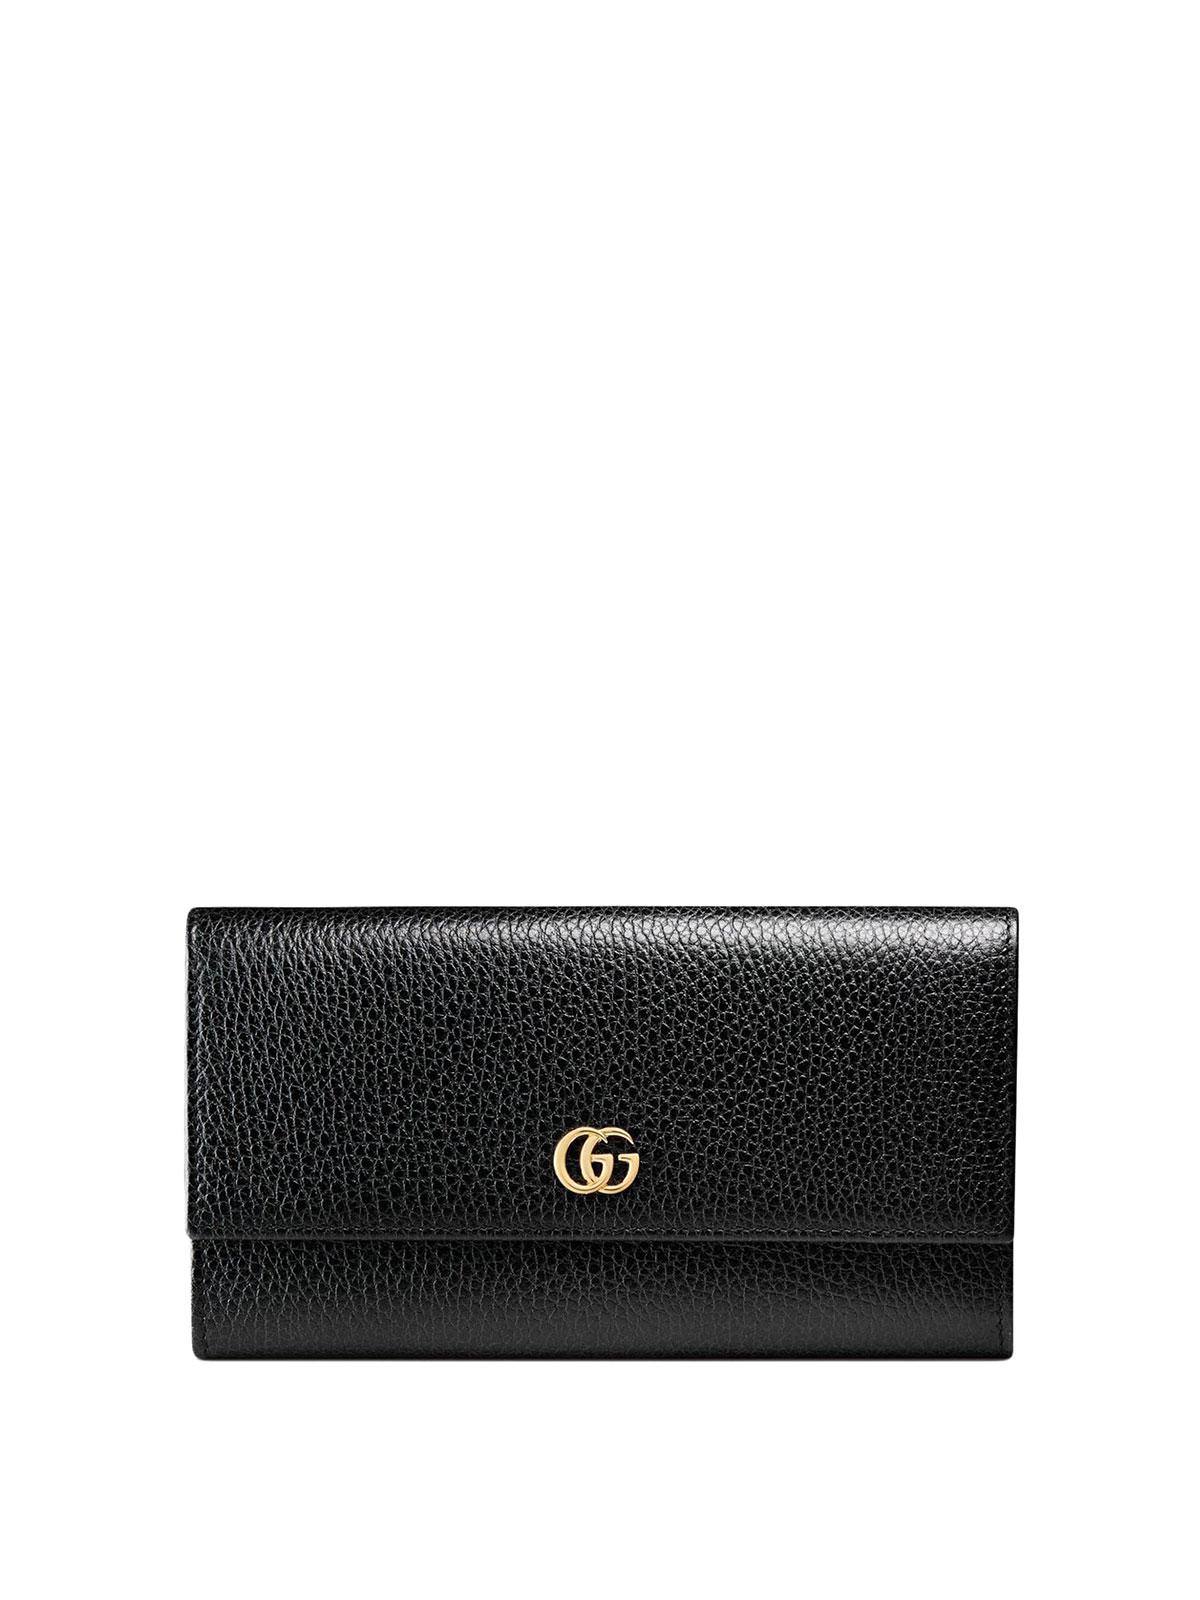 54f7e9ed76ec Gucci Wallet Online Shopping